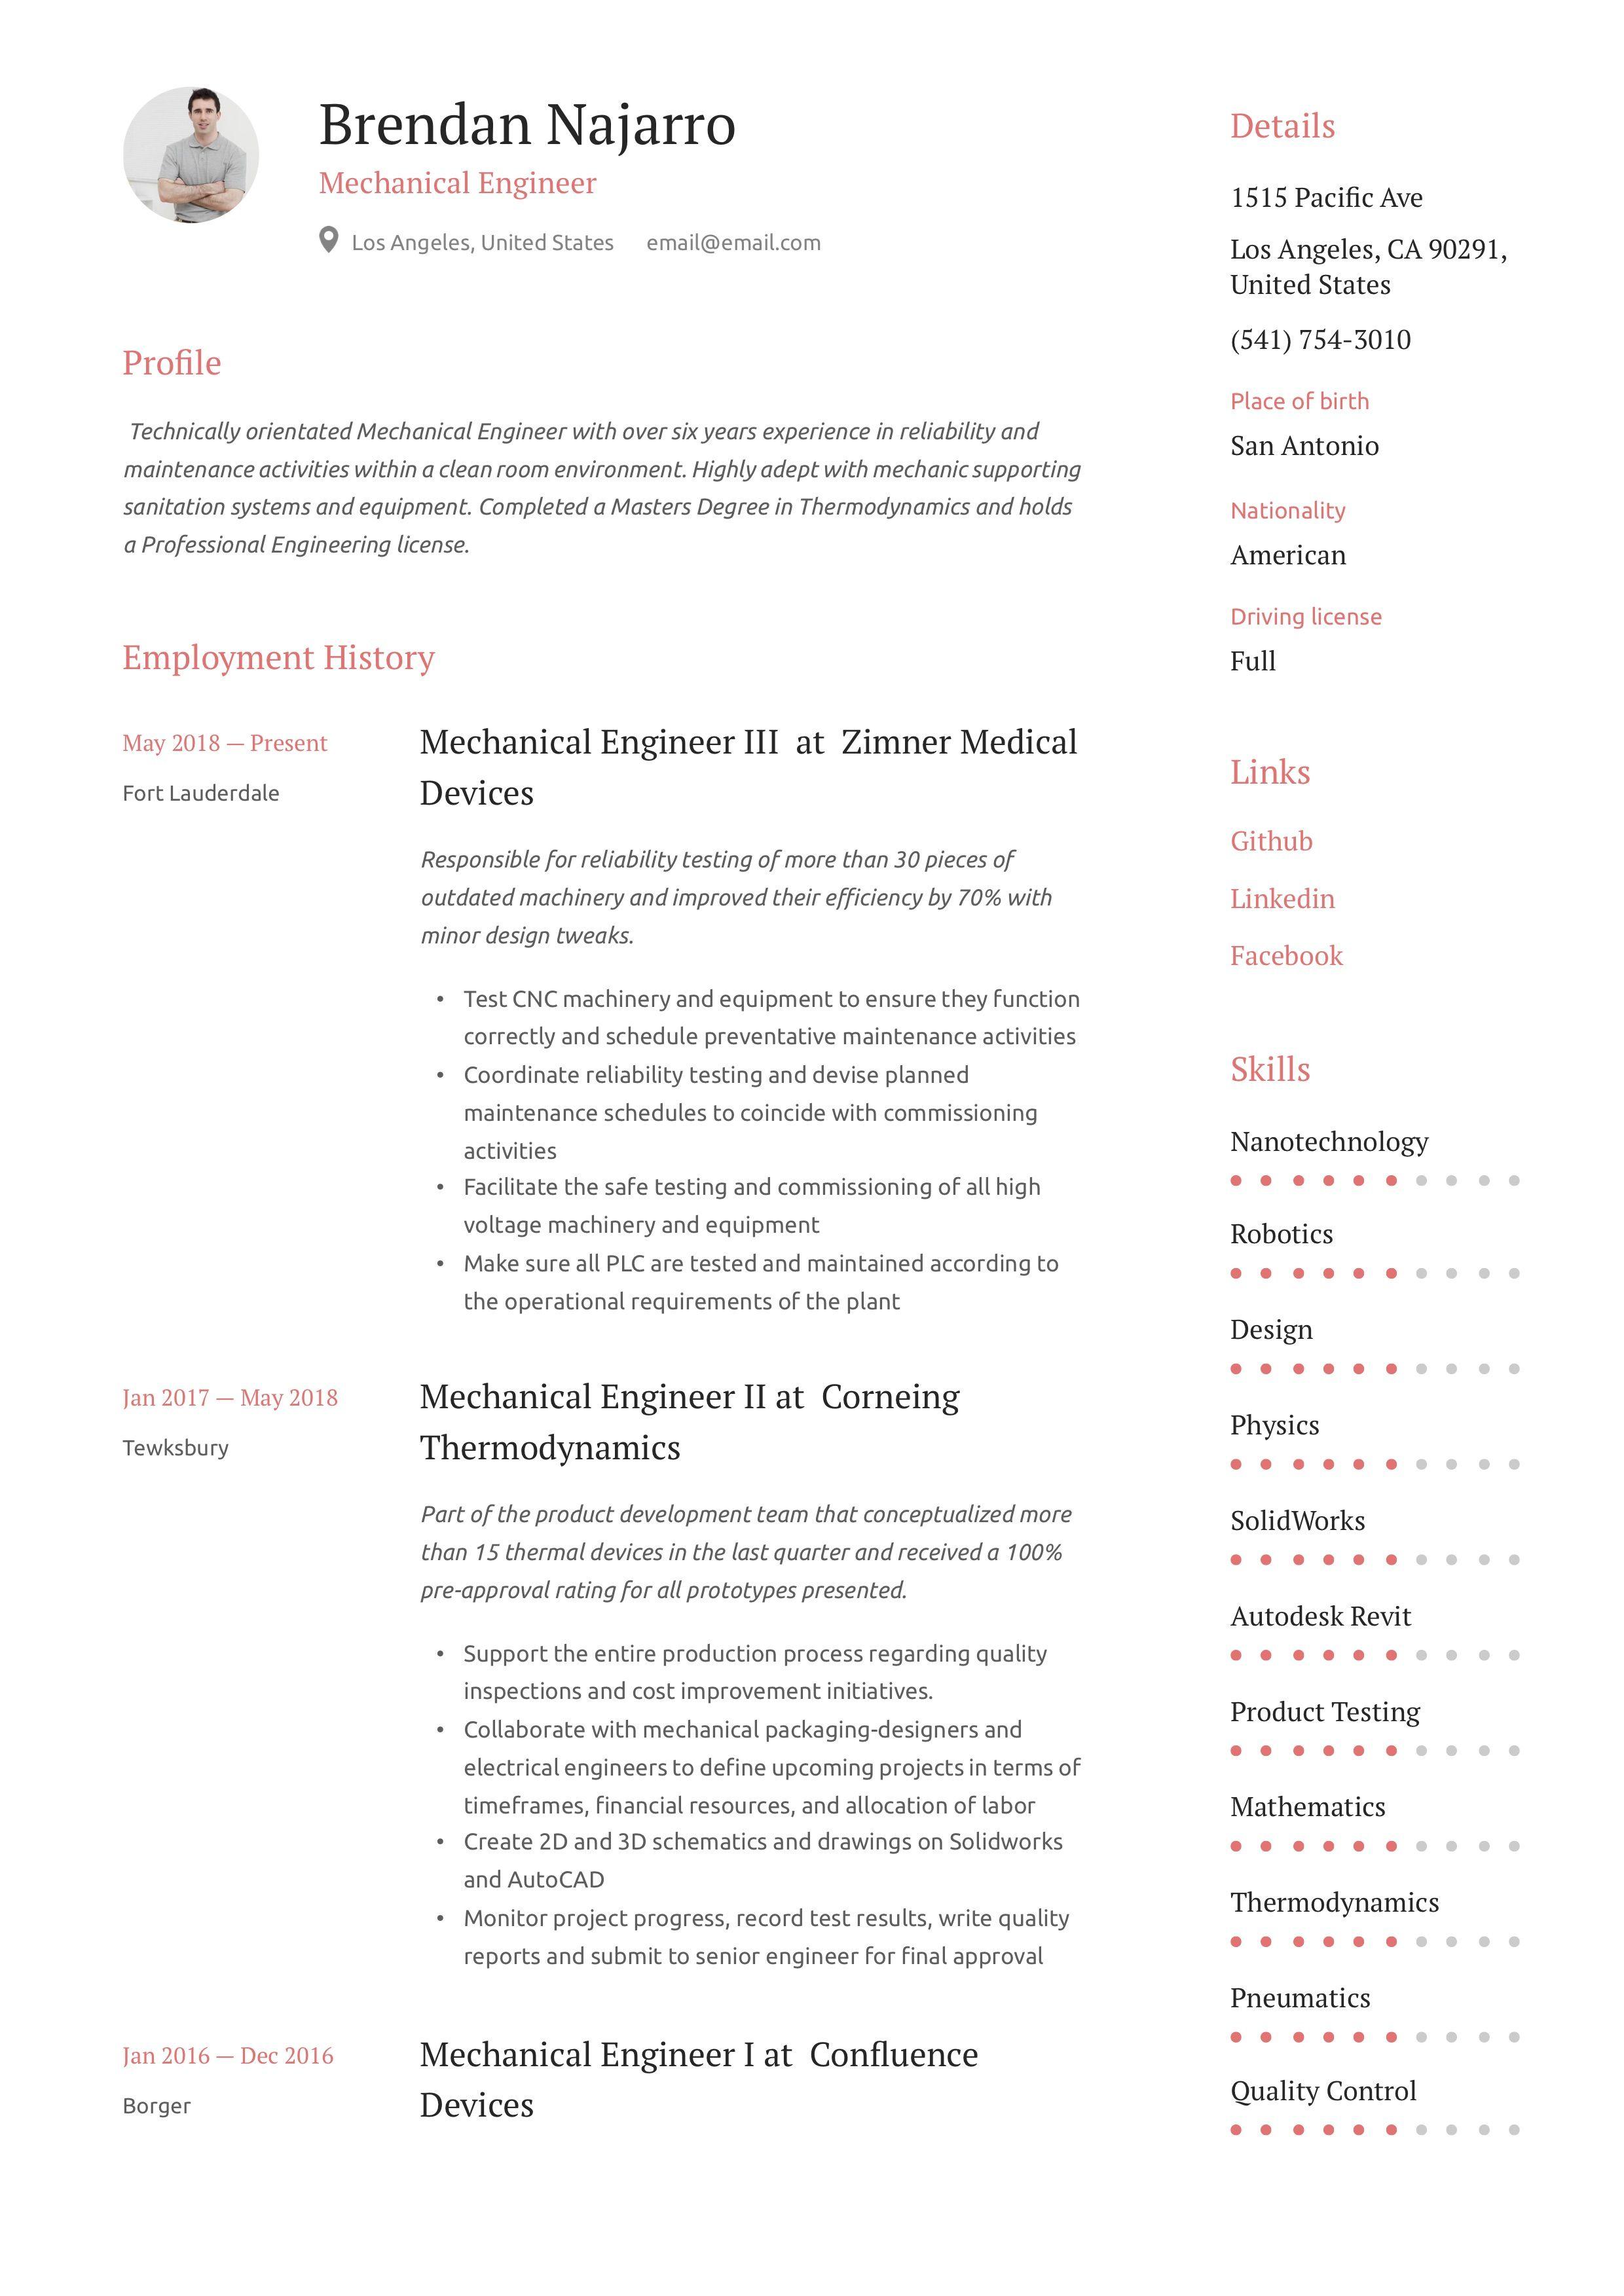 Mechanical engineer resume writing guide in 2020